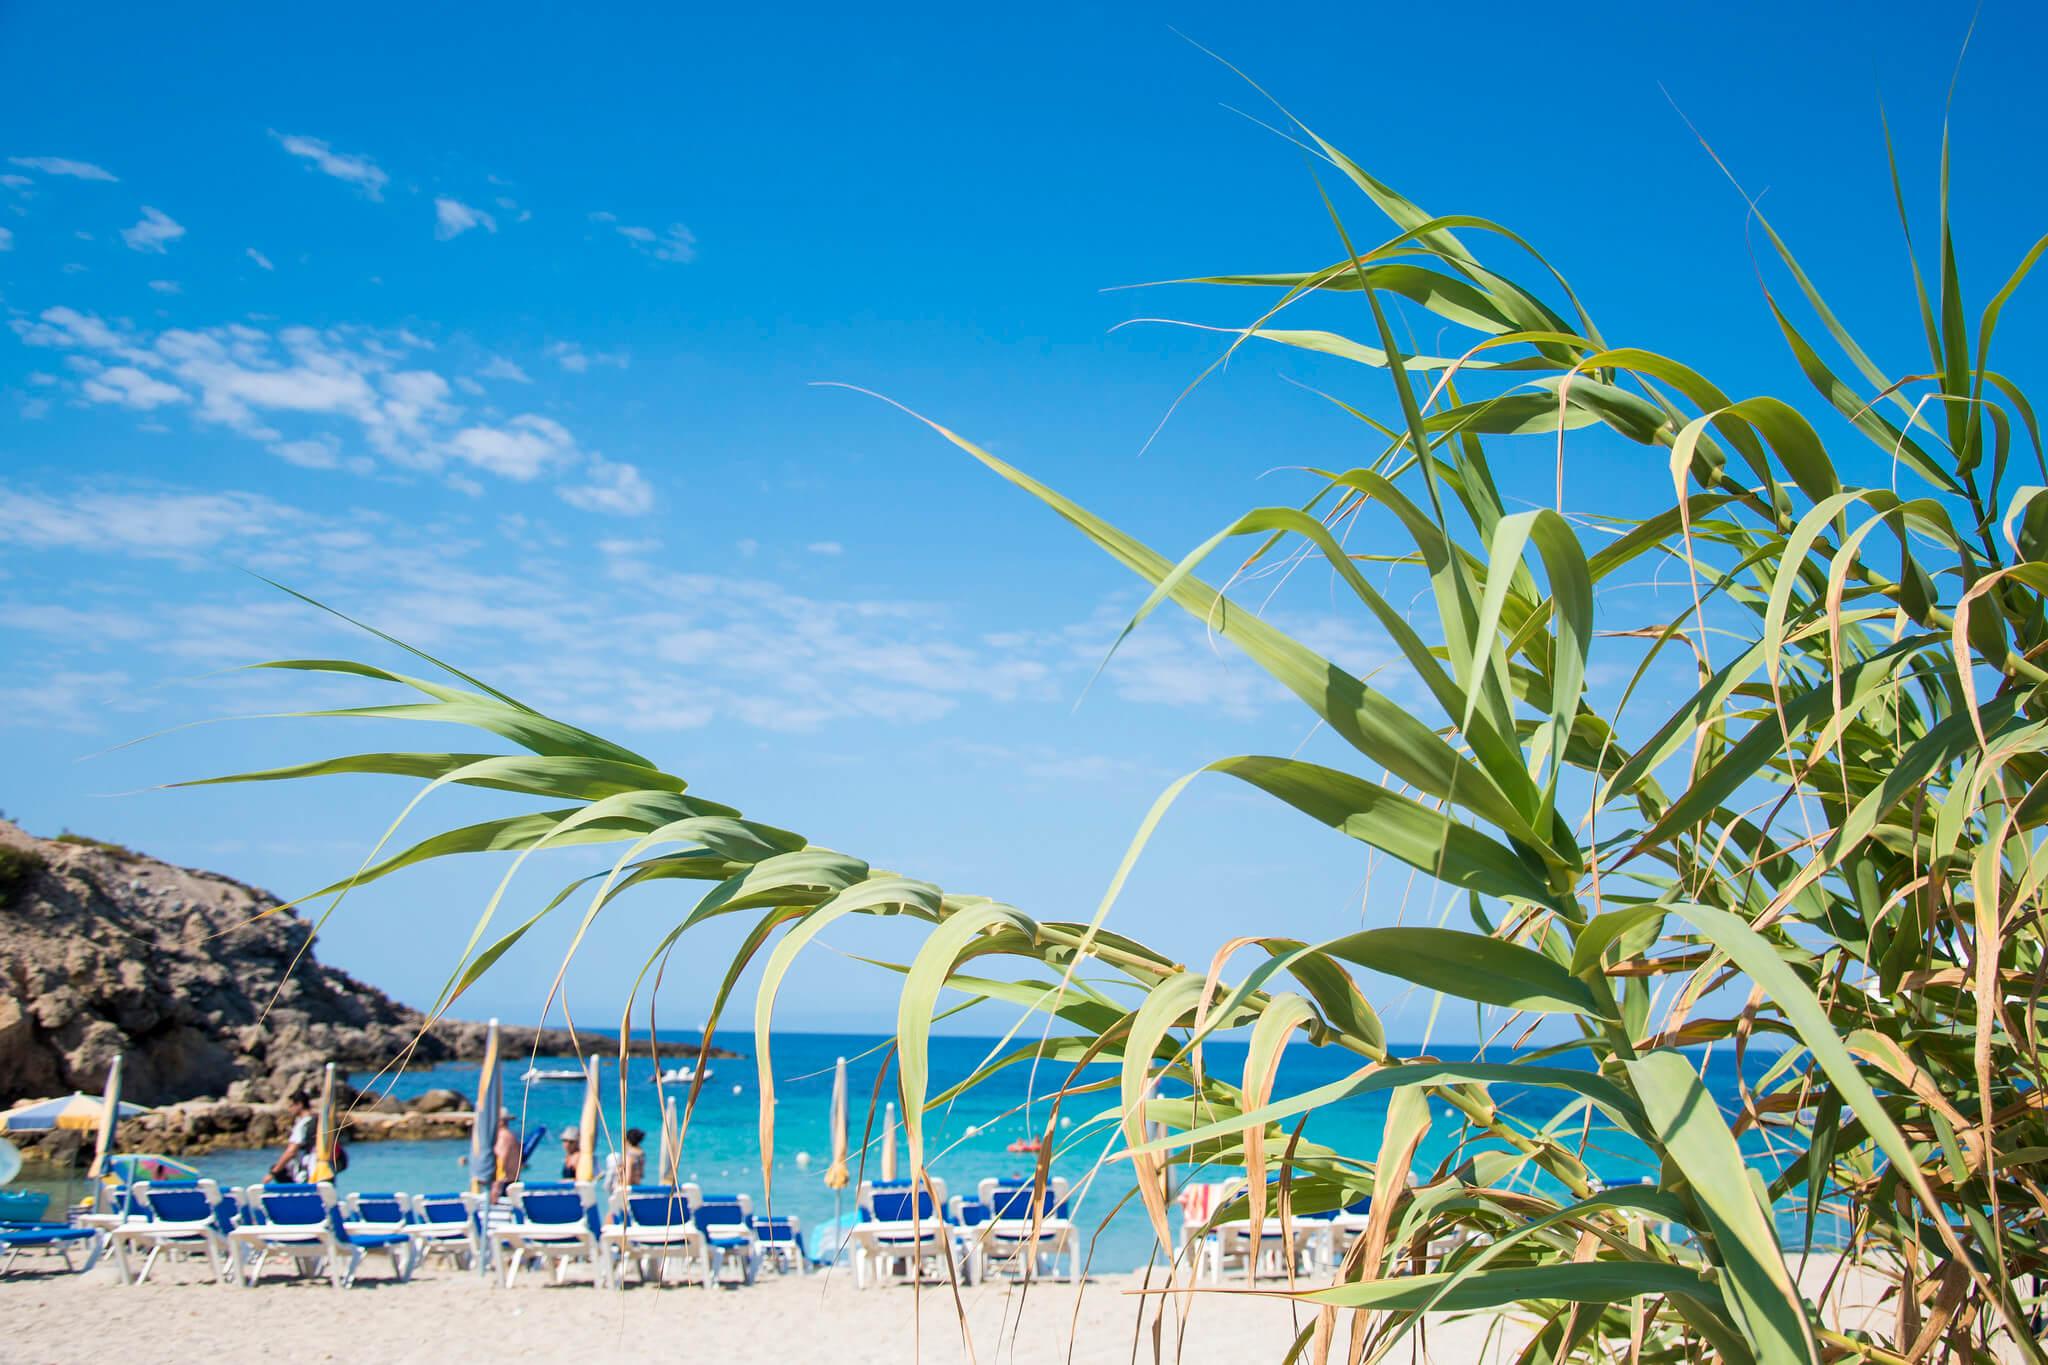 https://www.white-ibiza.com/wp-content/uploads/2020/03/ibiza-beaches-cala-codolar-02.jpg